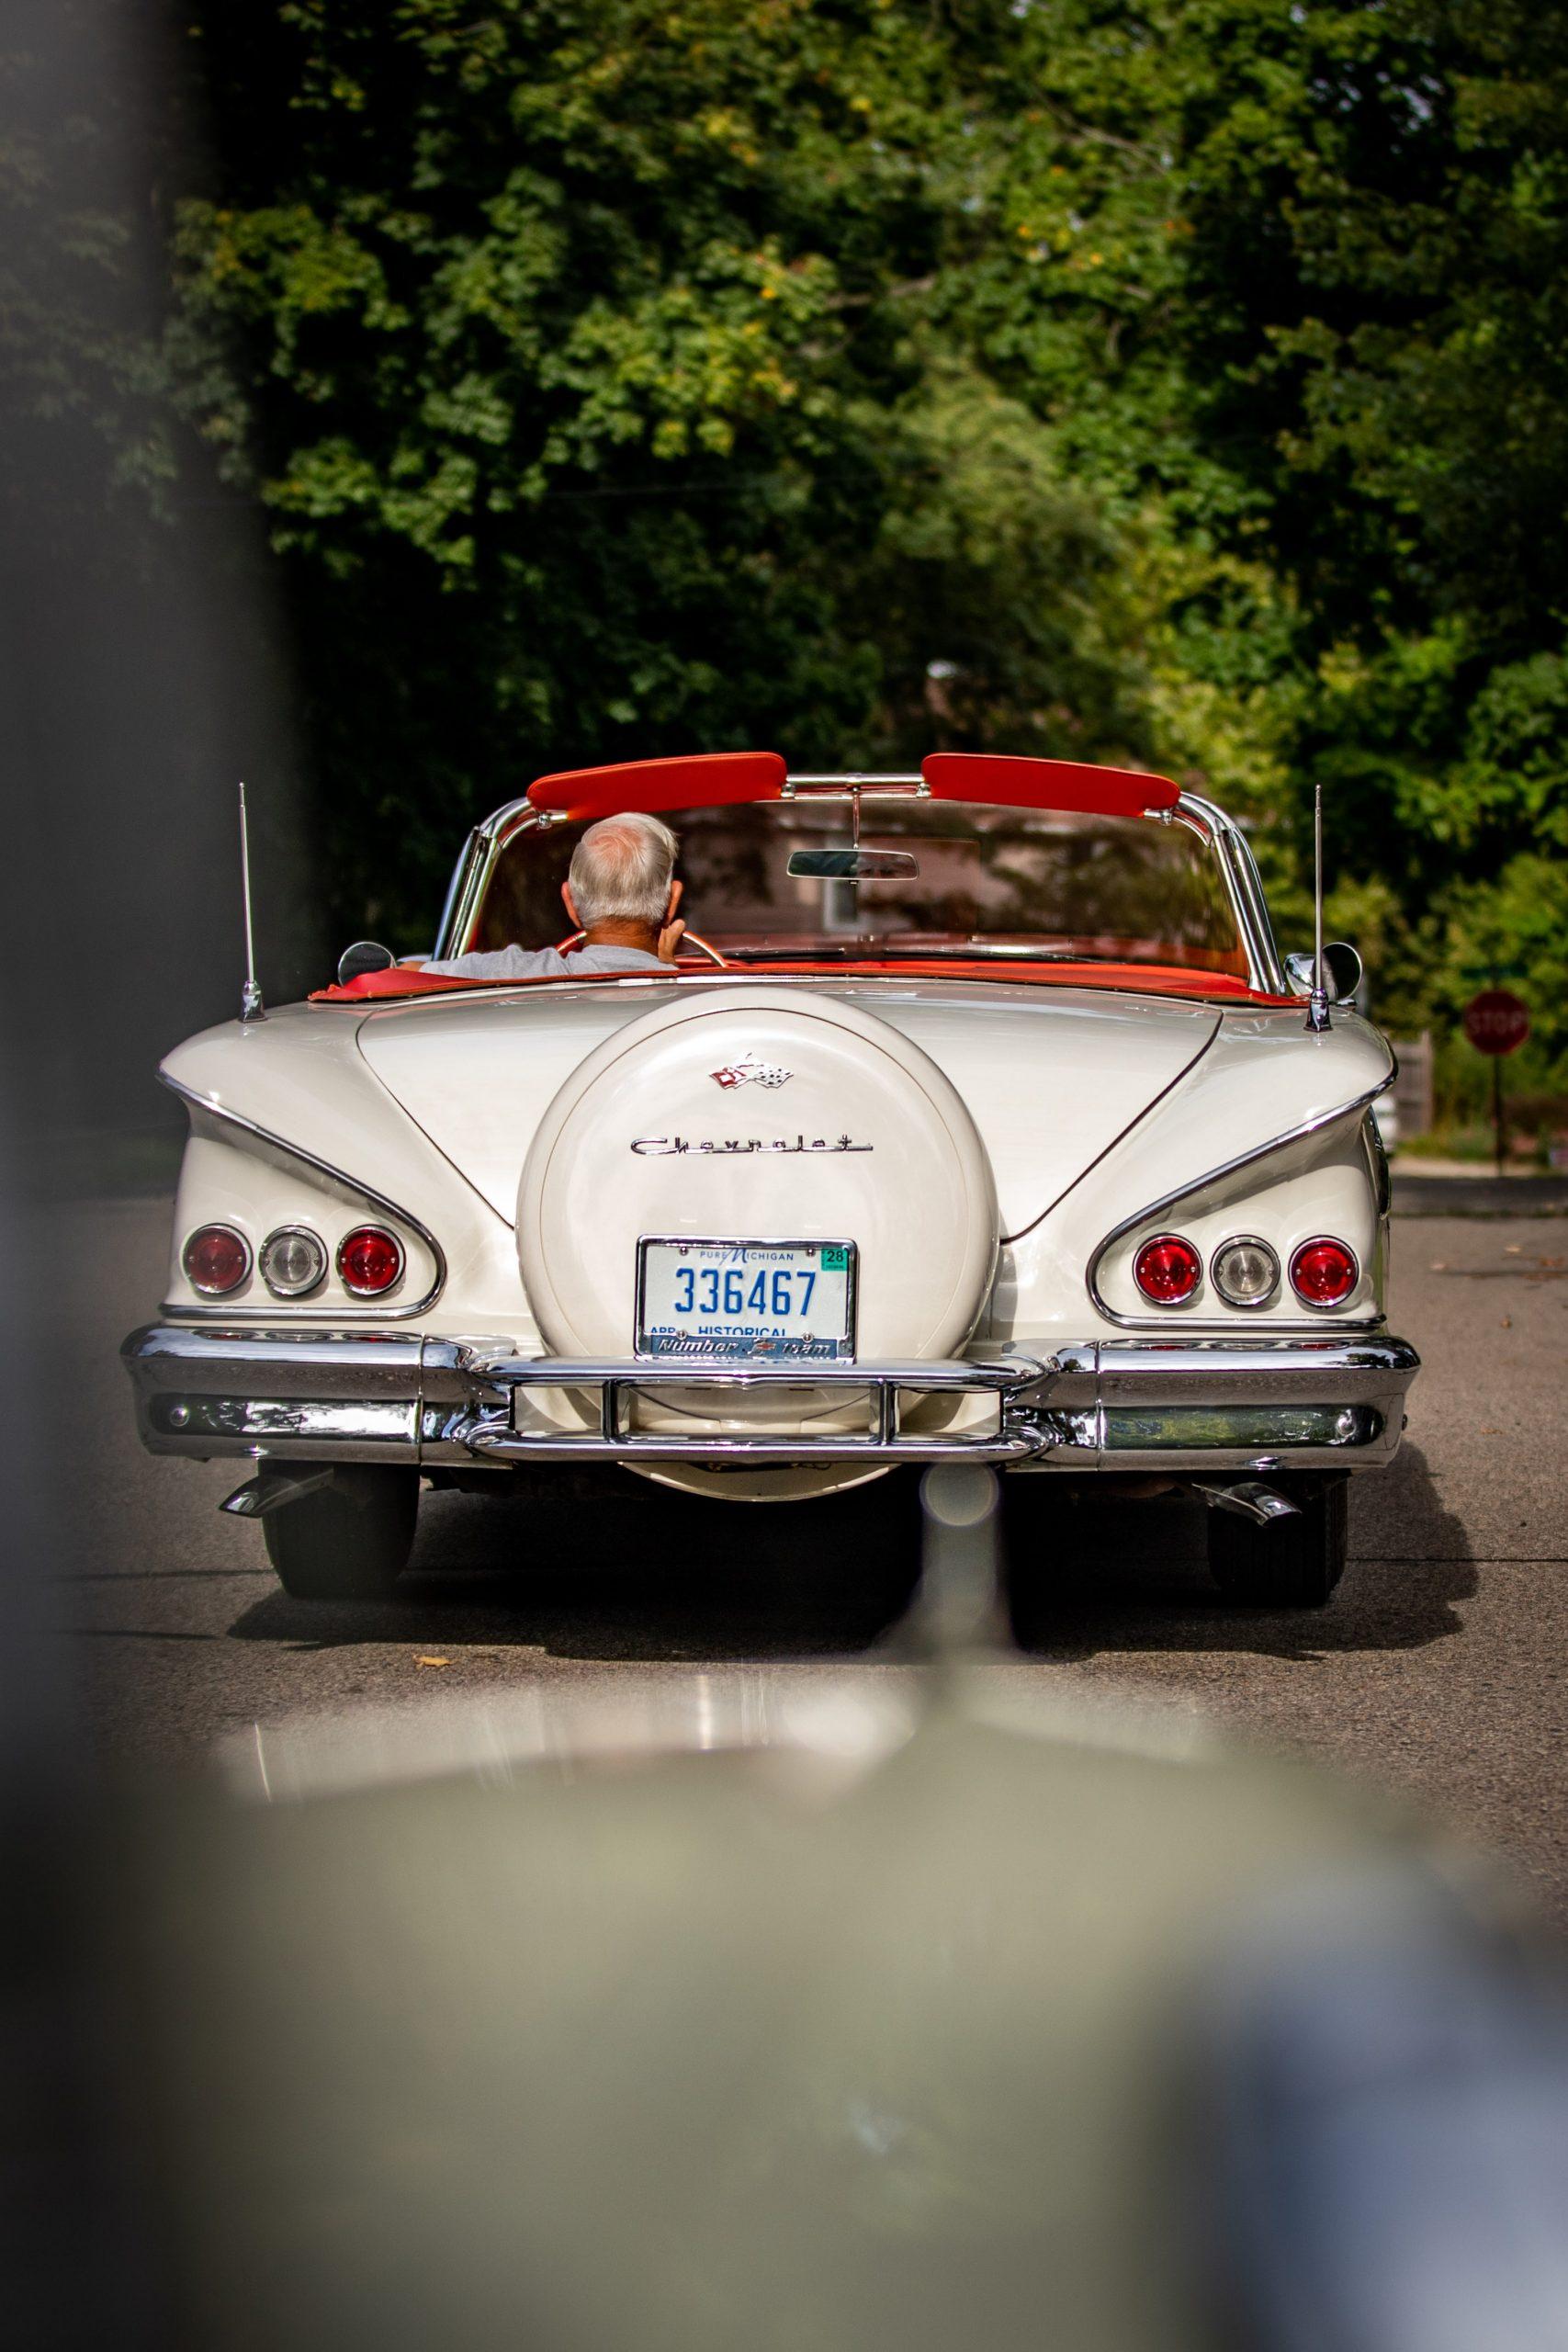 1958 Chevrolet Impala Convertible Rear